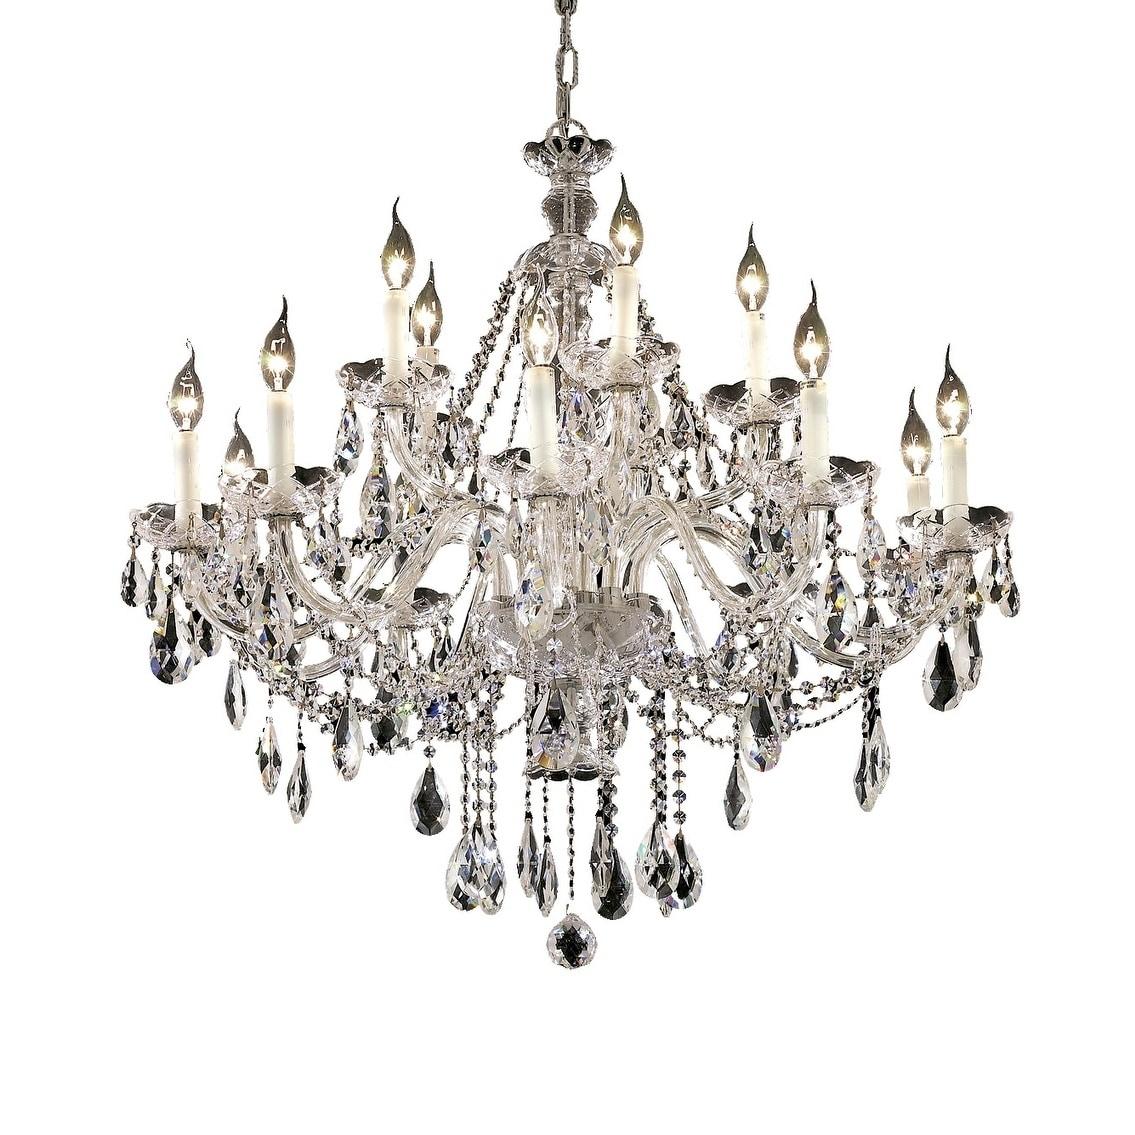 Shop fleur illumination 15 light chrome chandelier free shipping today overstock 20457068